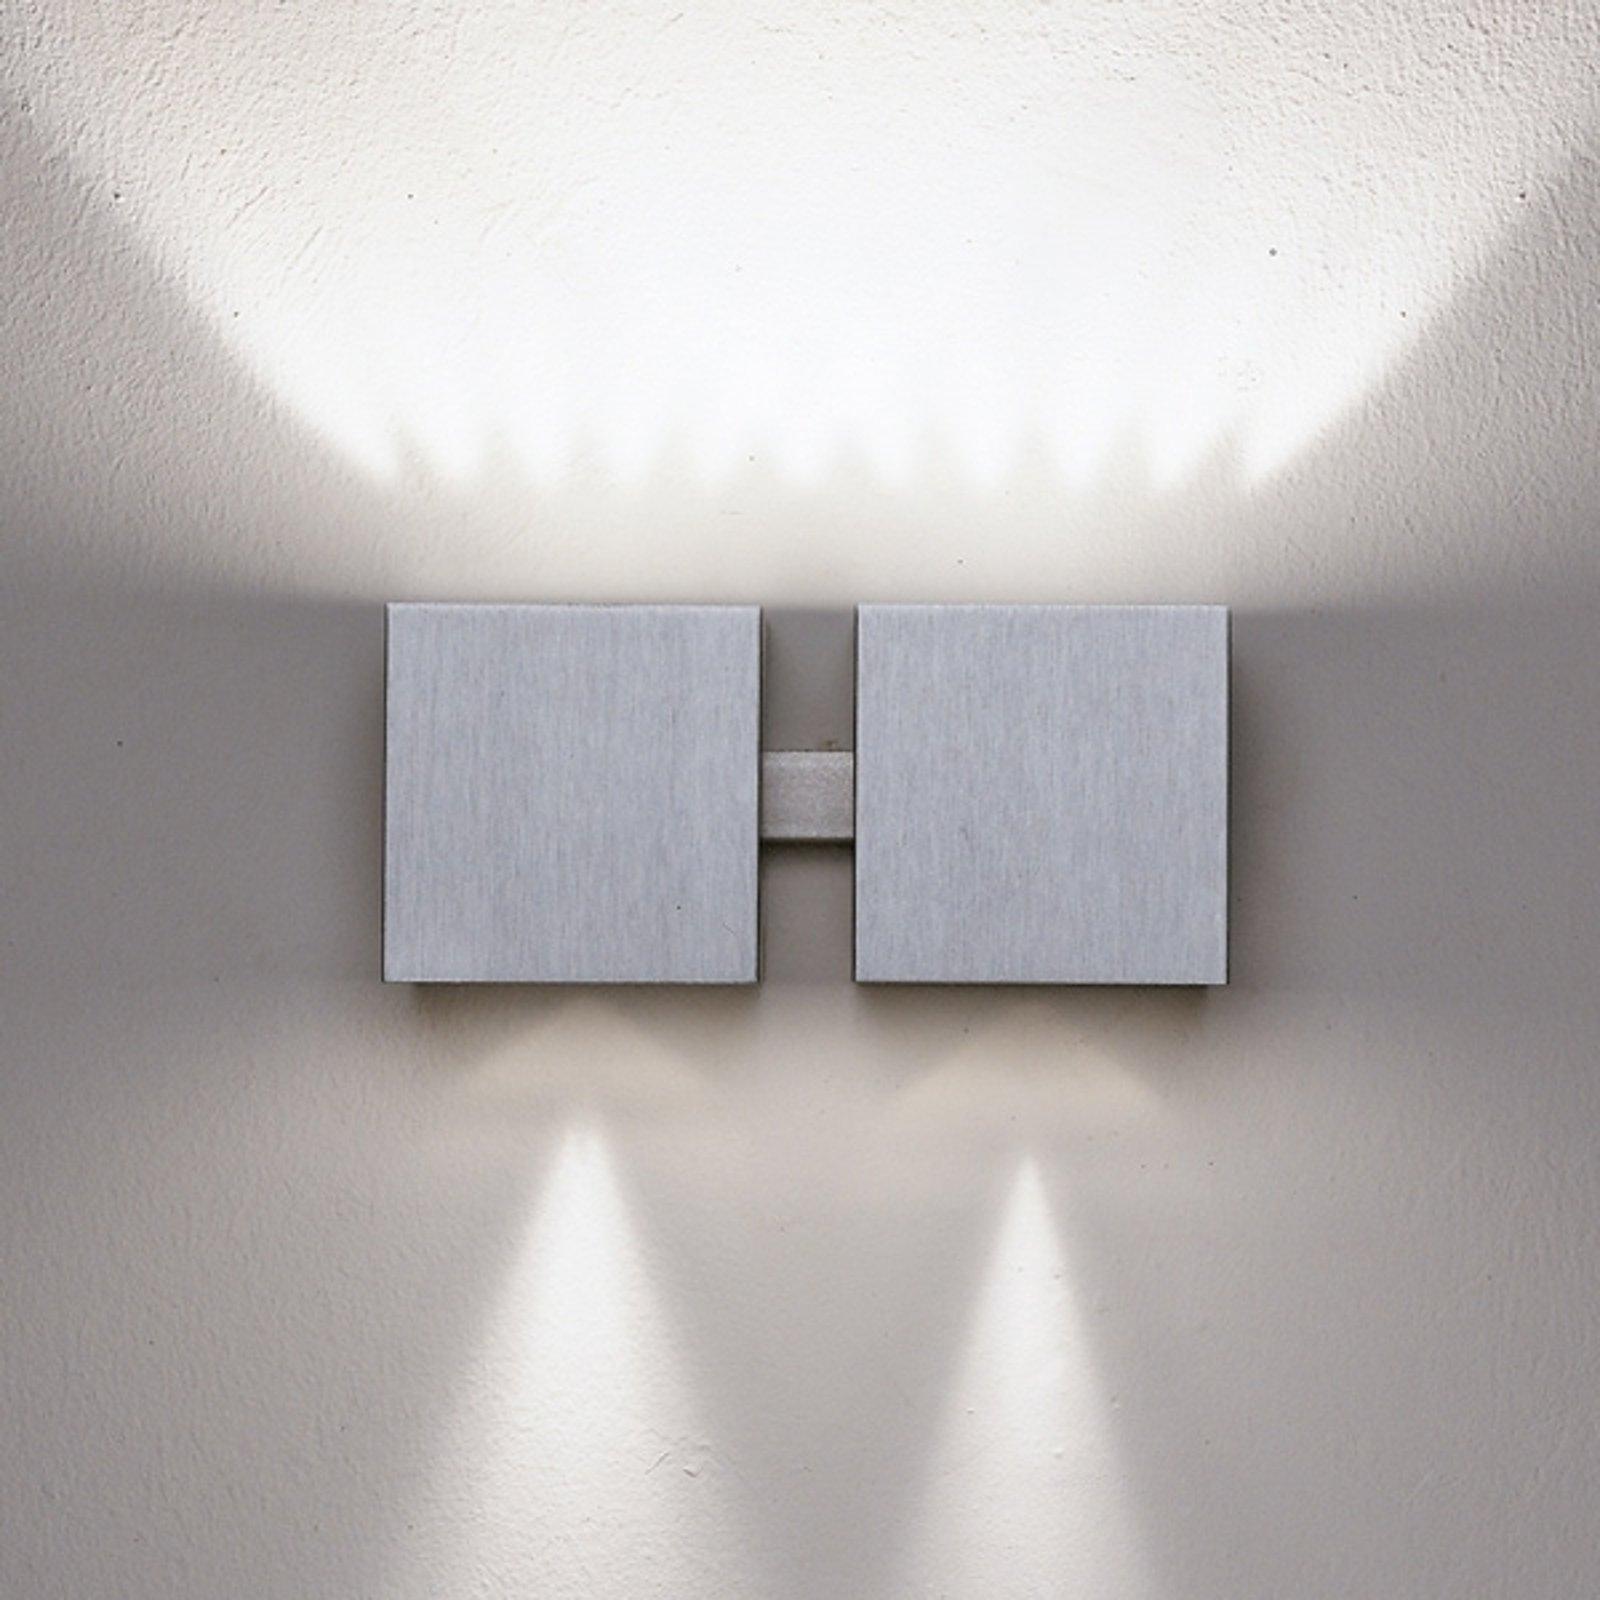 Vegglampe Dau up-og downlight aluminium 2 lys